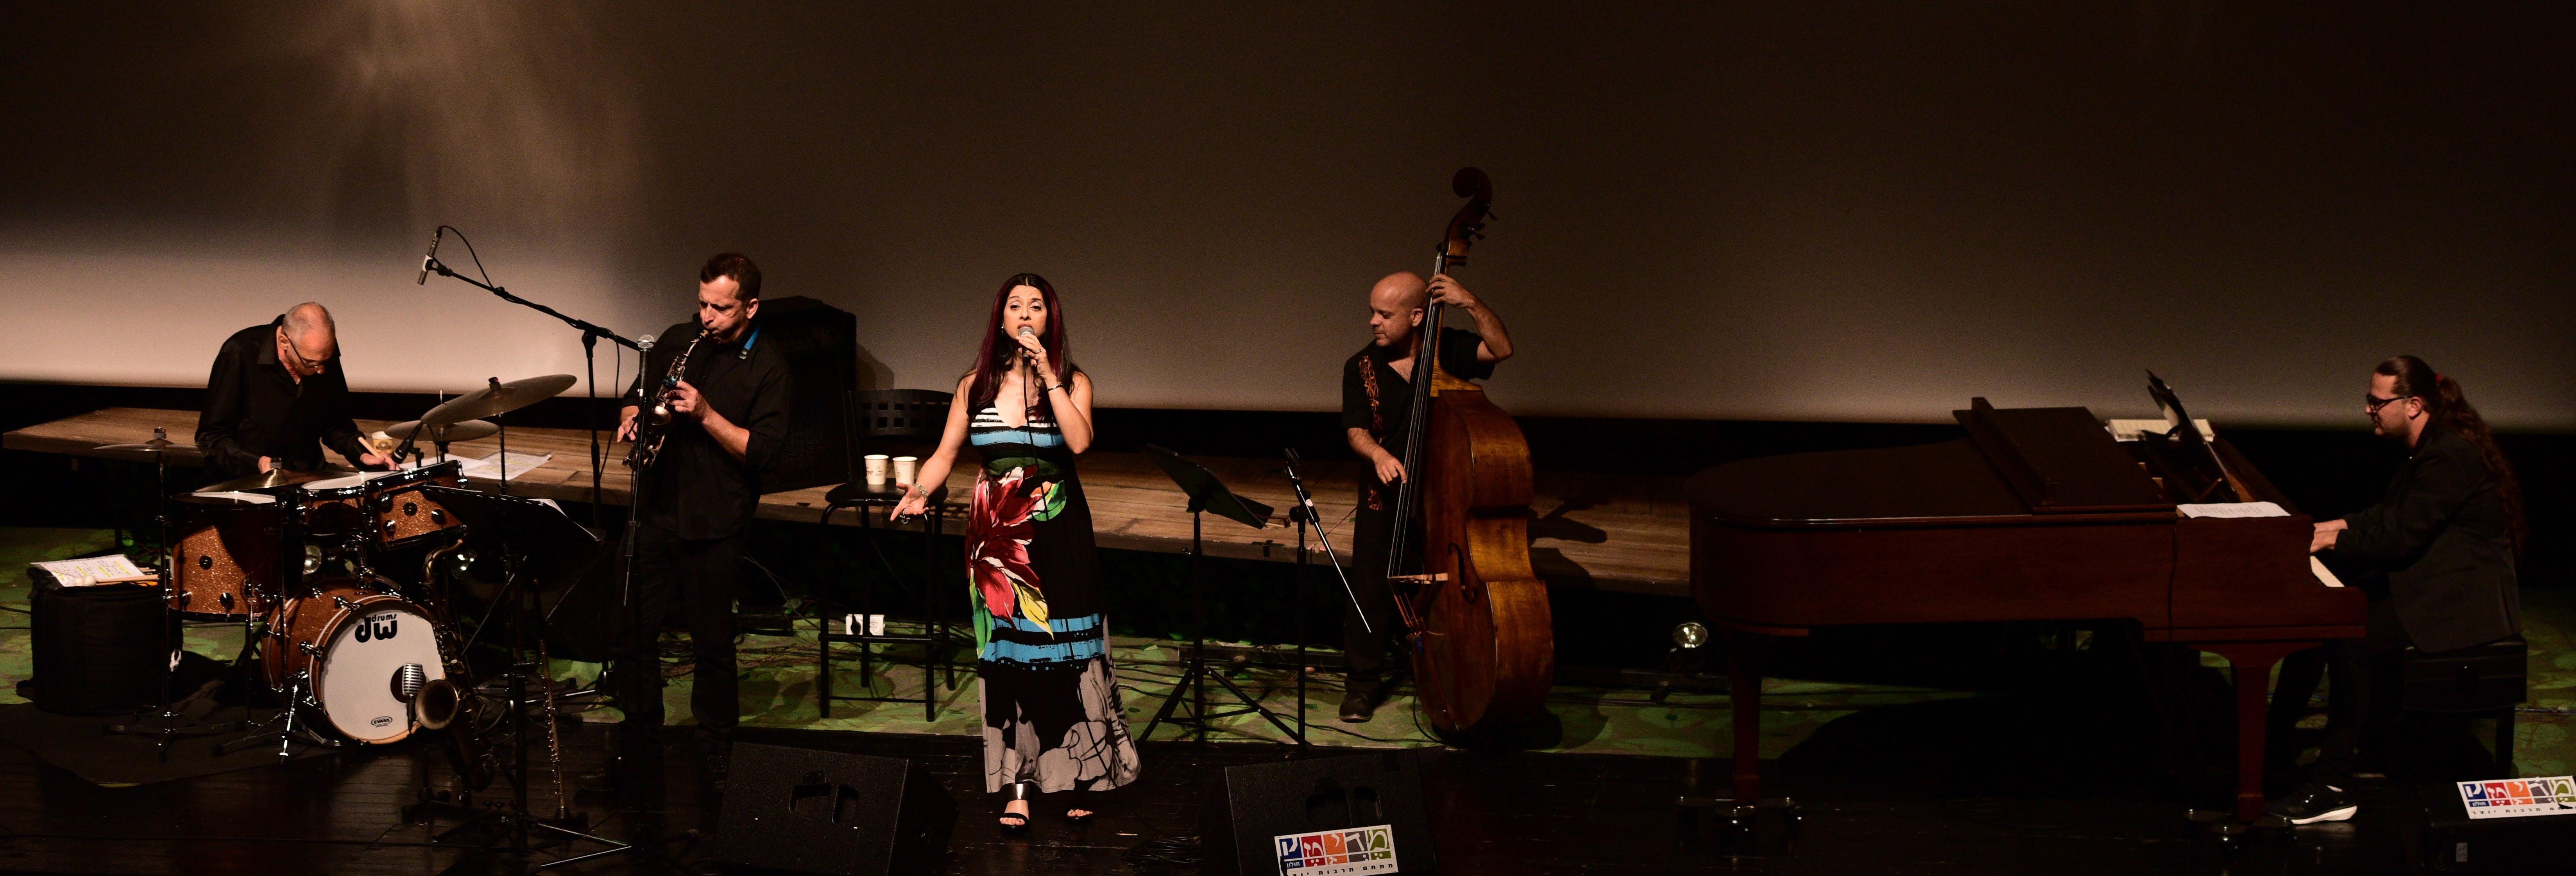 With guest artist Amiram Granot